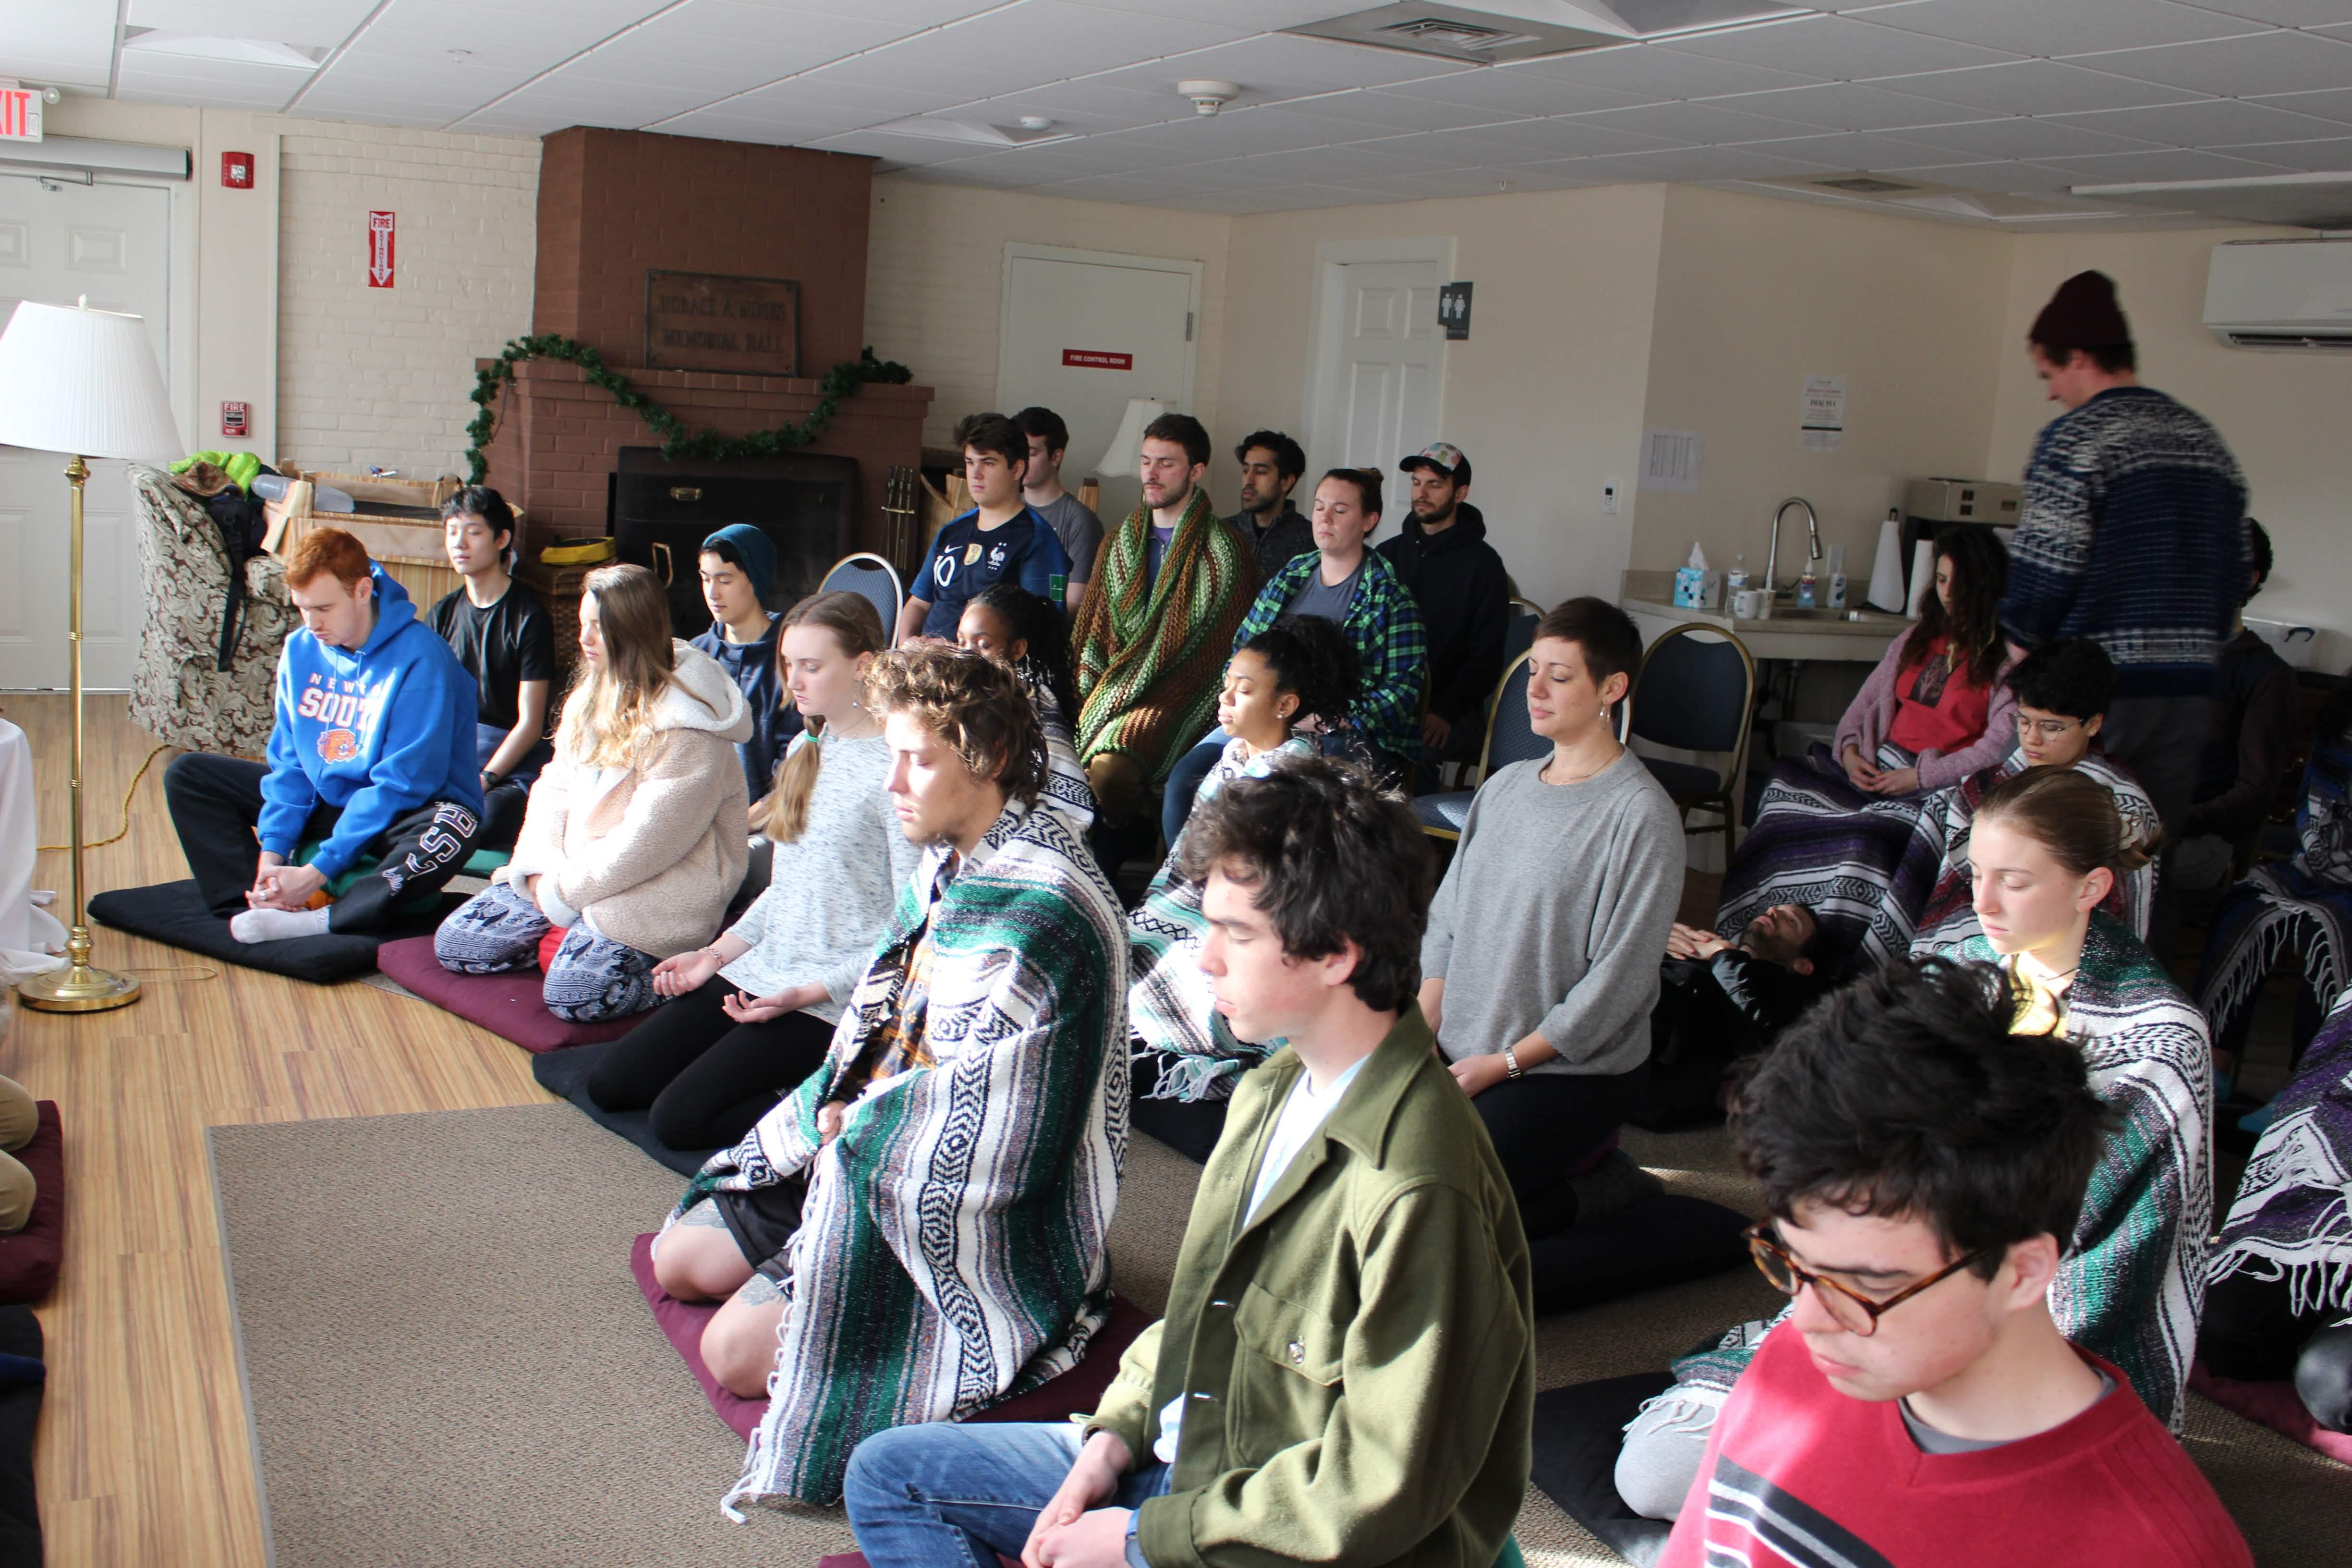 Summer Program - Meditation | Inward Bound Mindfulness Education: UK Retreat for Young People